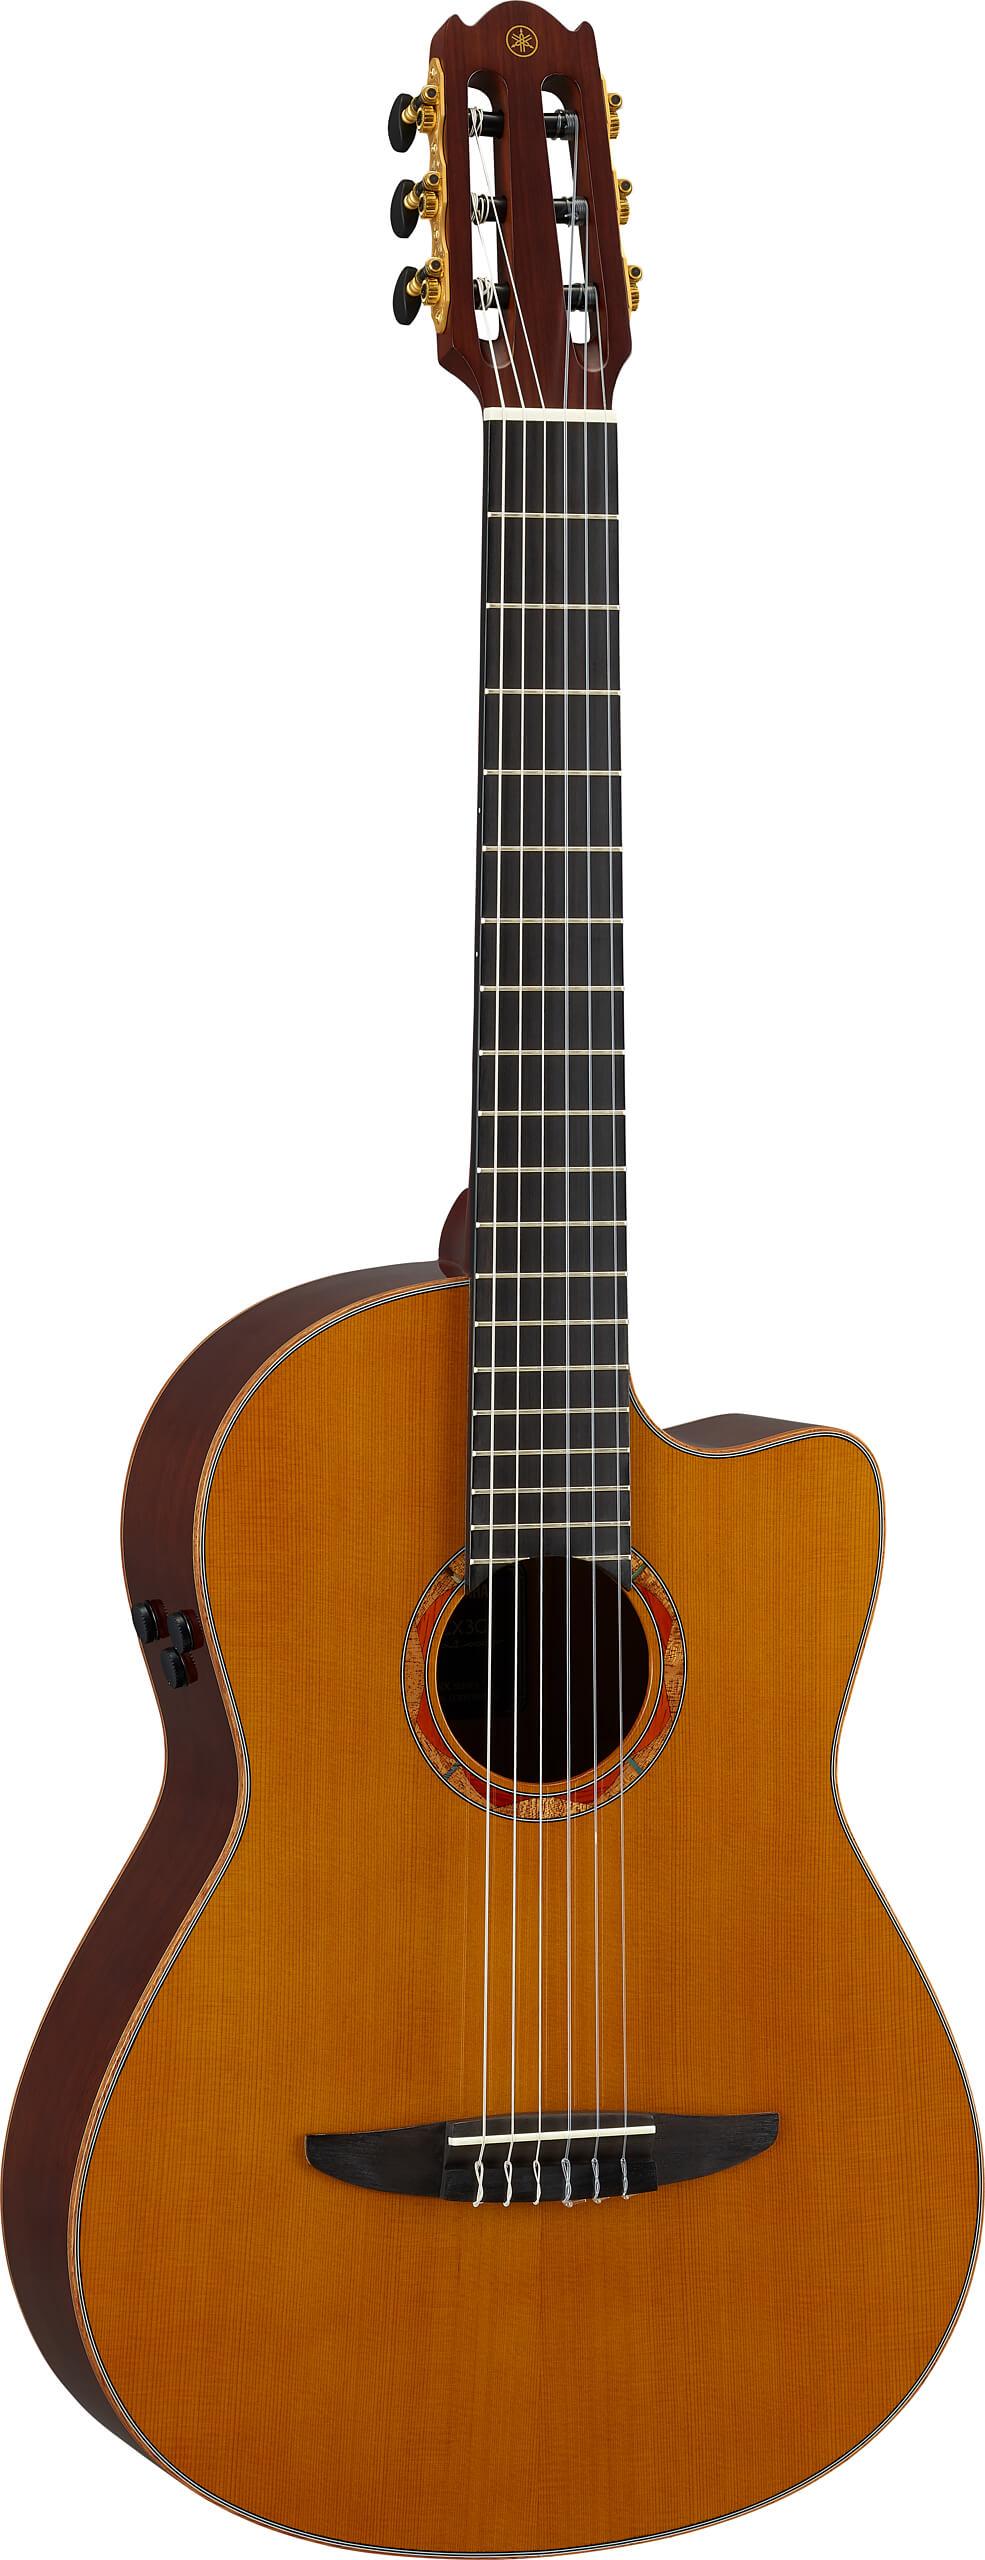 Guitarra Clásica Electrificada Yamaha NCX3 Cedro